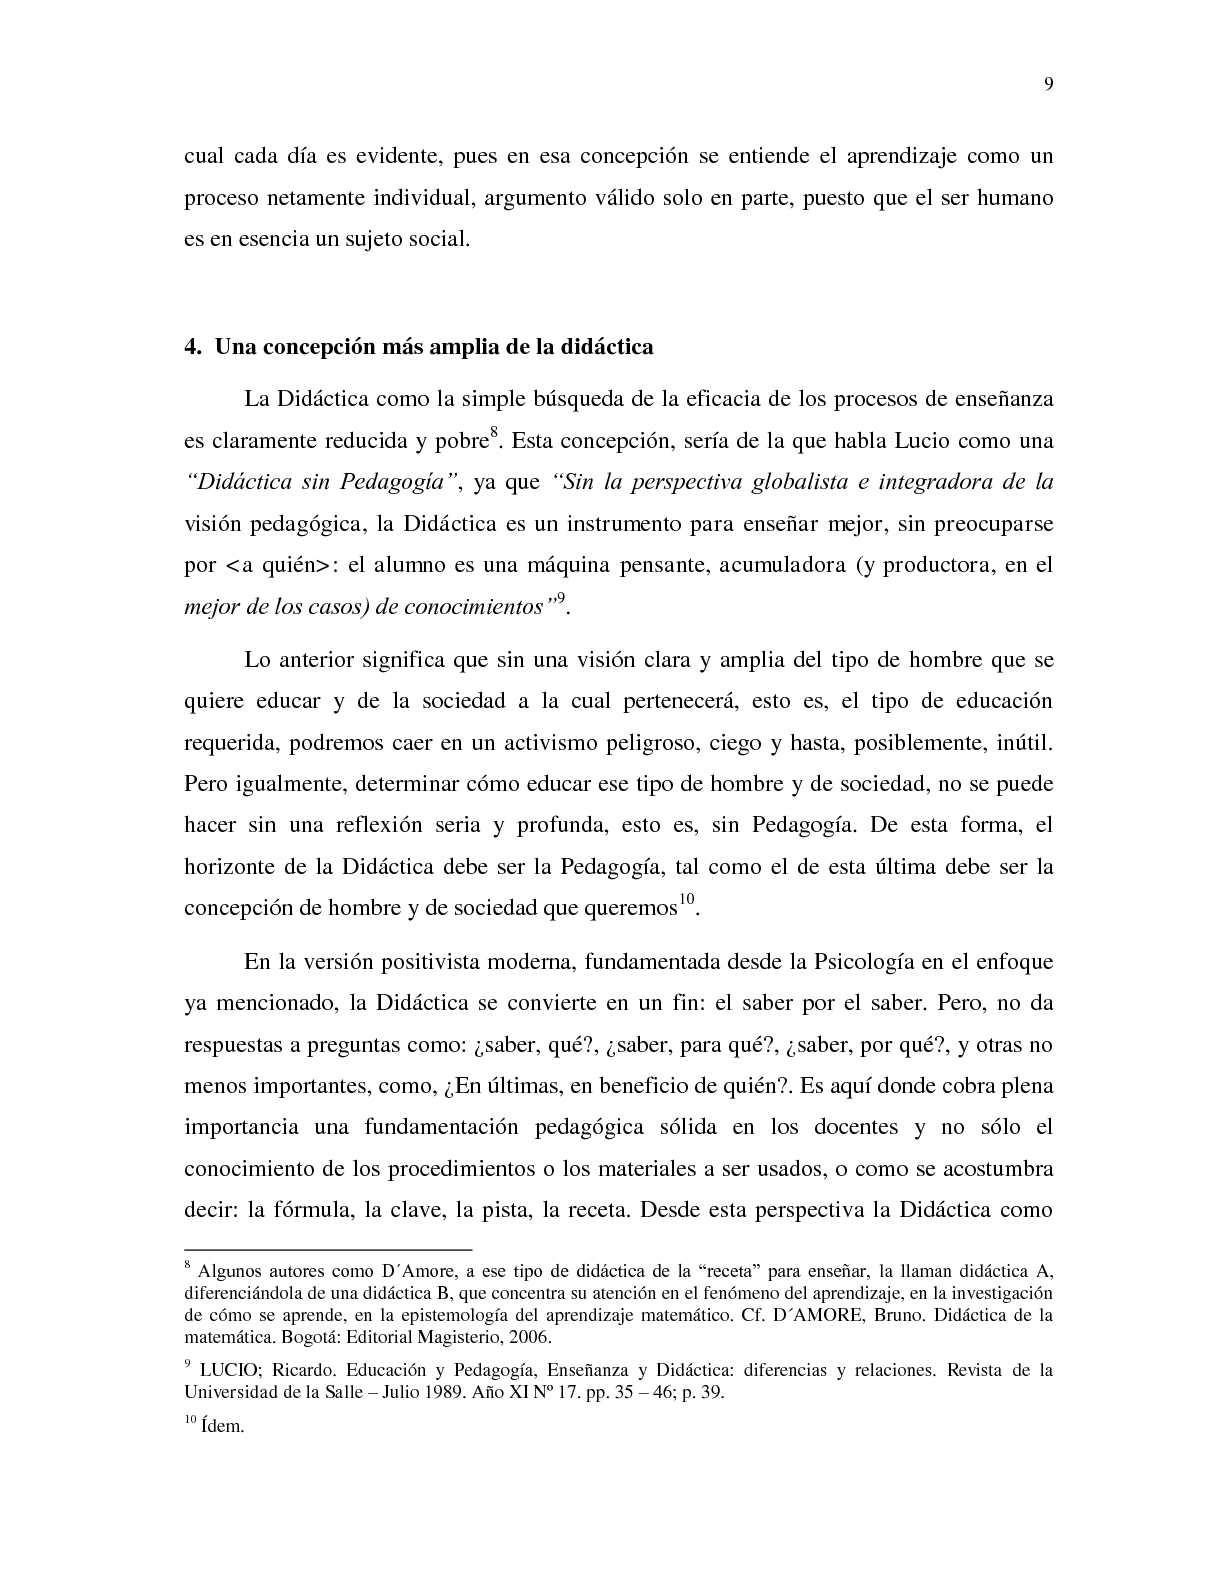 Contemporáneo Escritor De Curriculum Vitae Inspiración - Ejemplo De ...